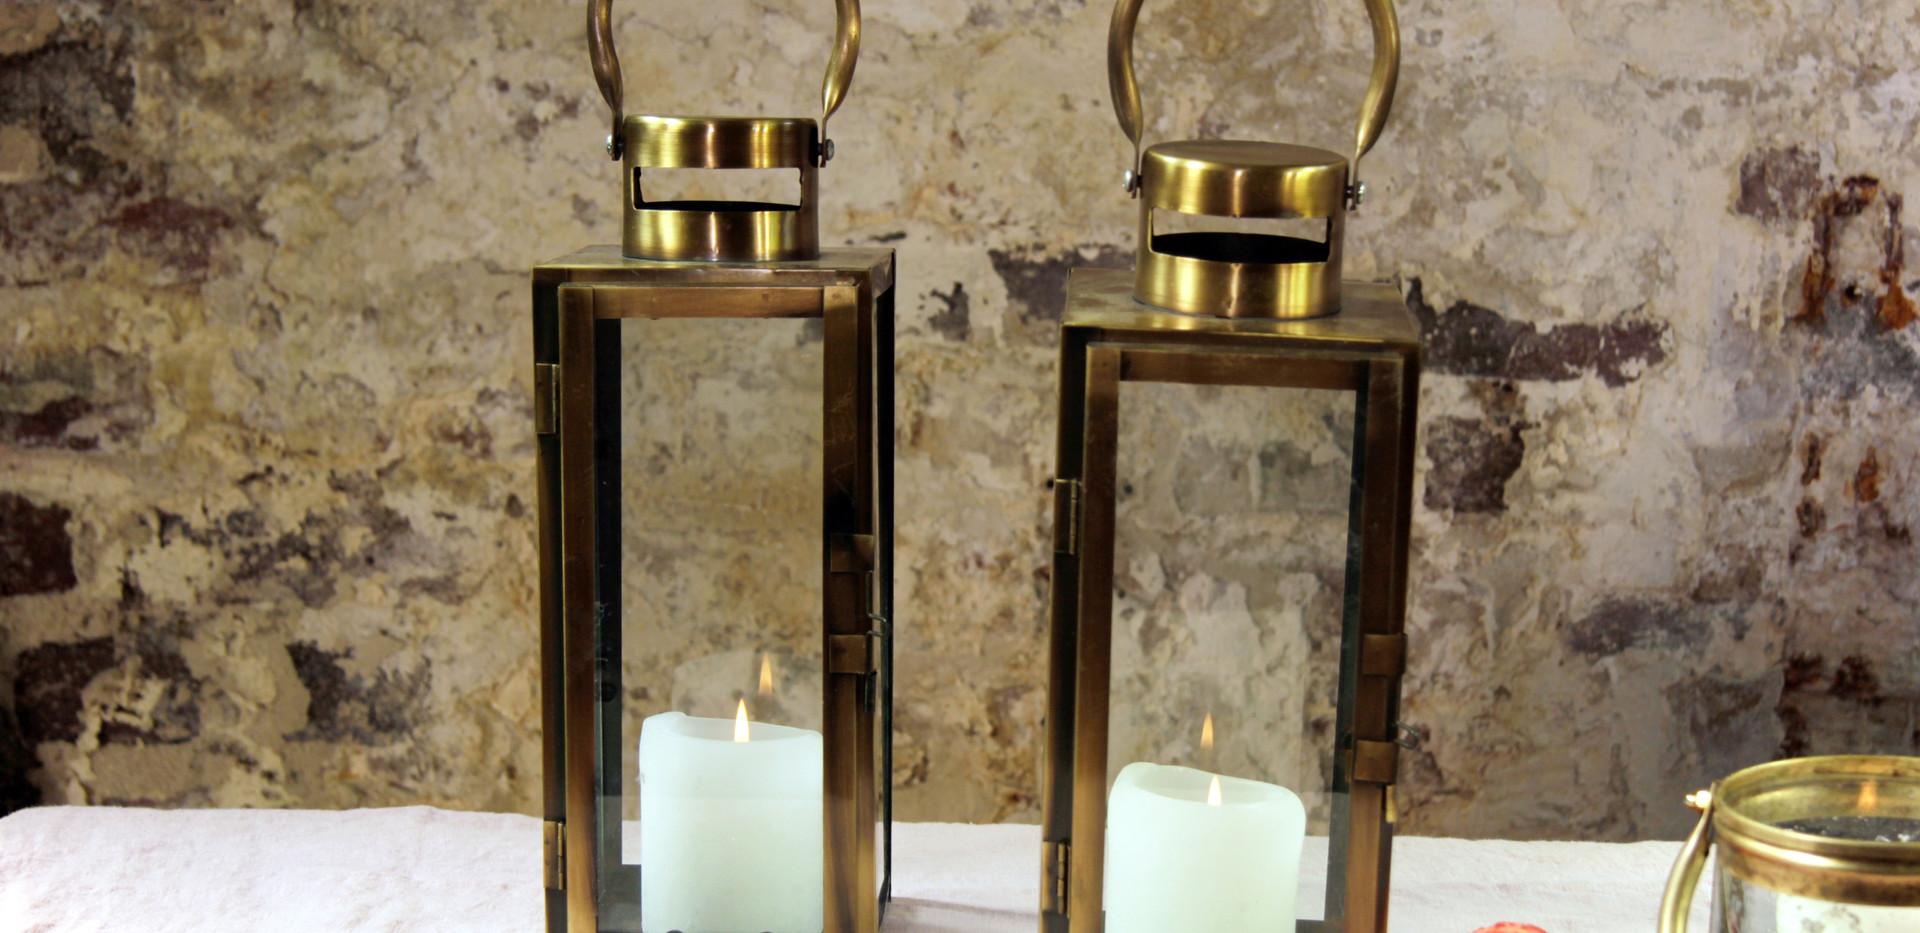 Windlichter gold-groß 2 - Je Stk. 5,50 Euro